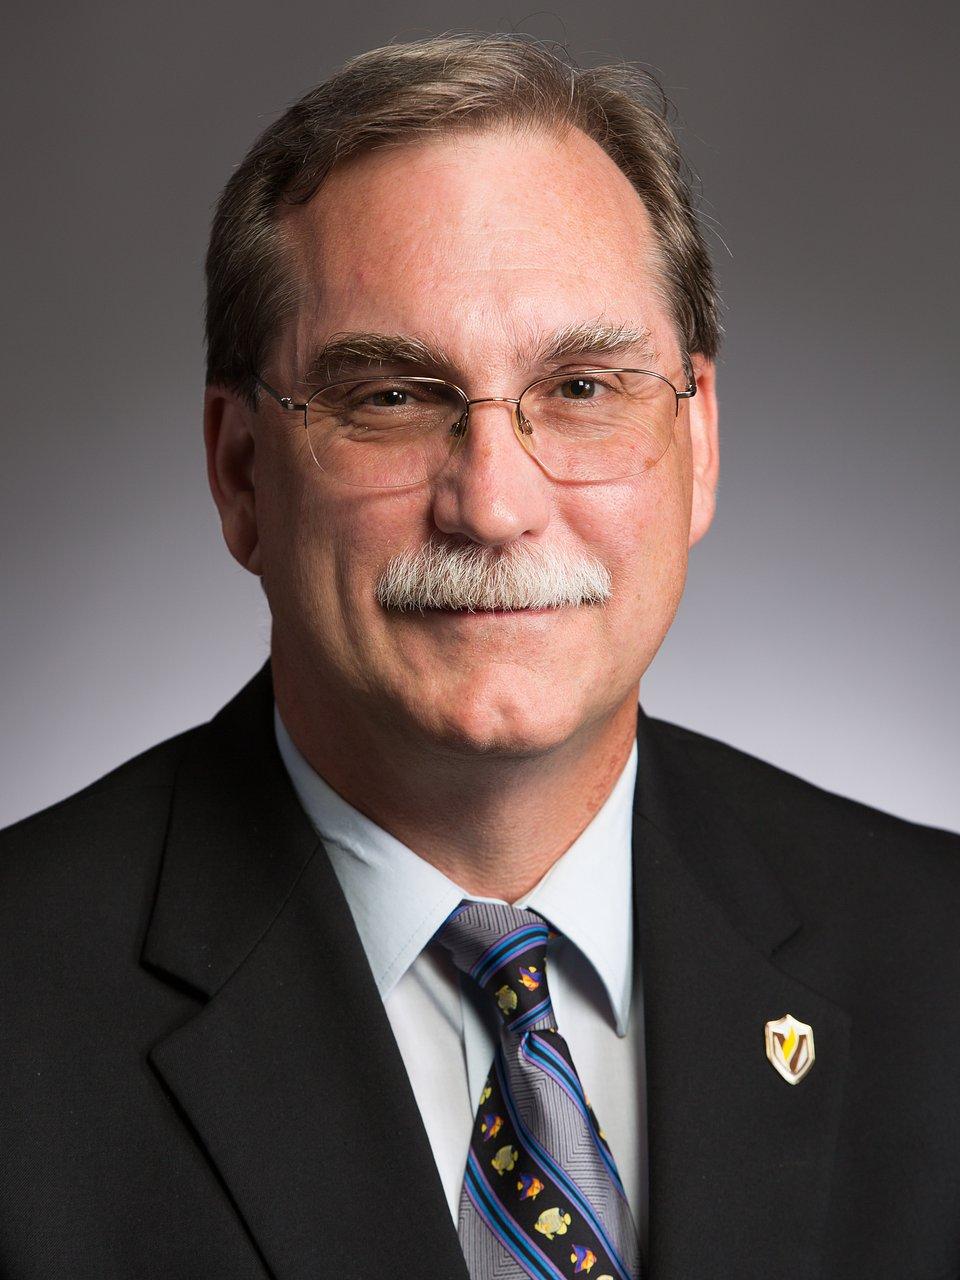 Rick Gillman